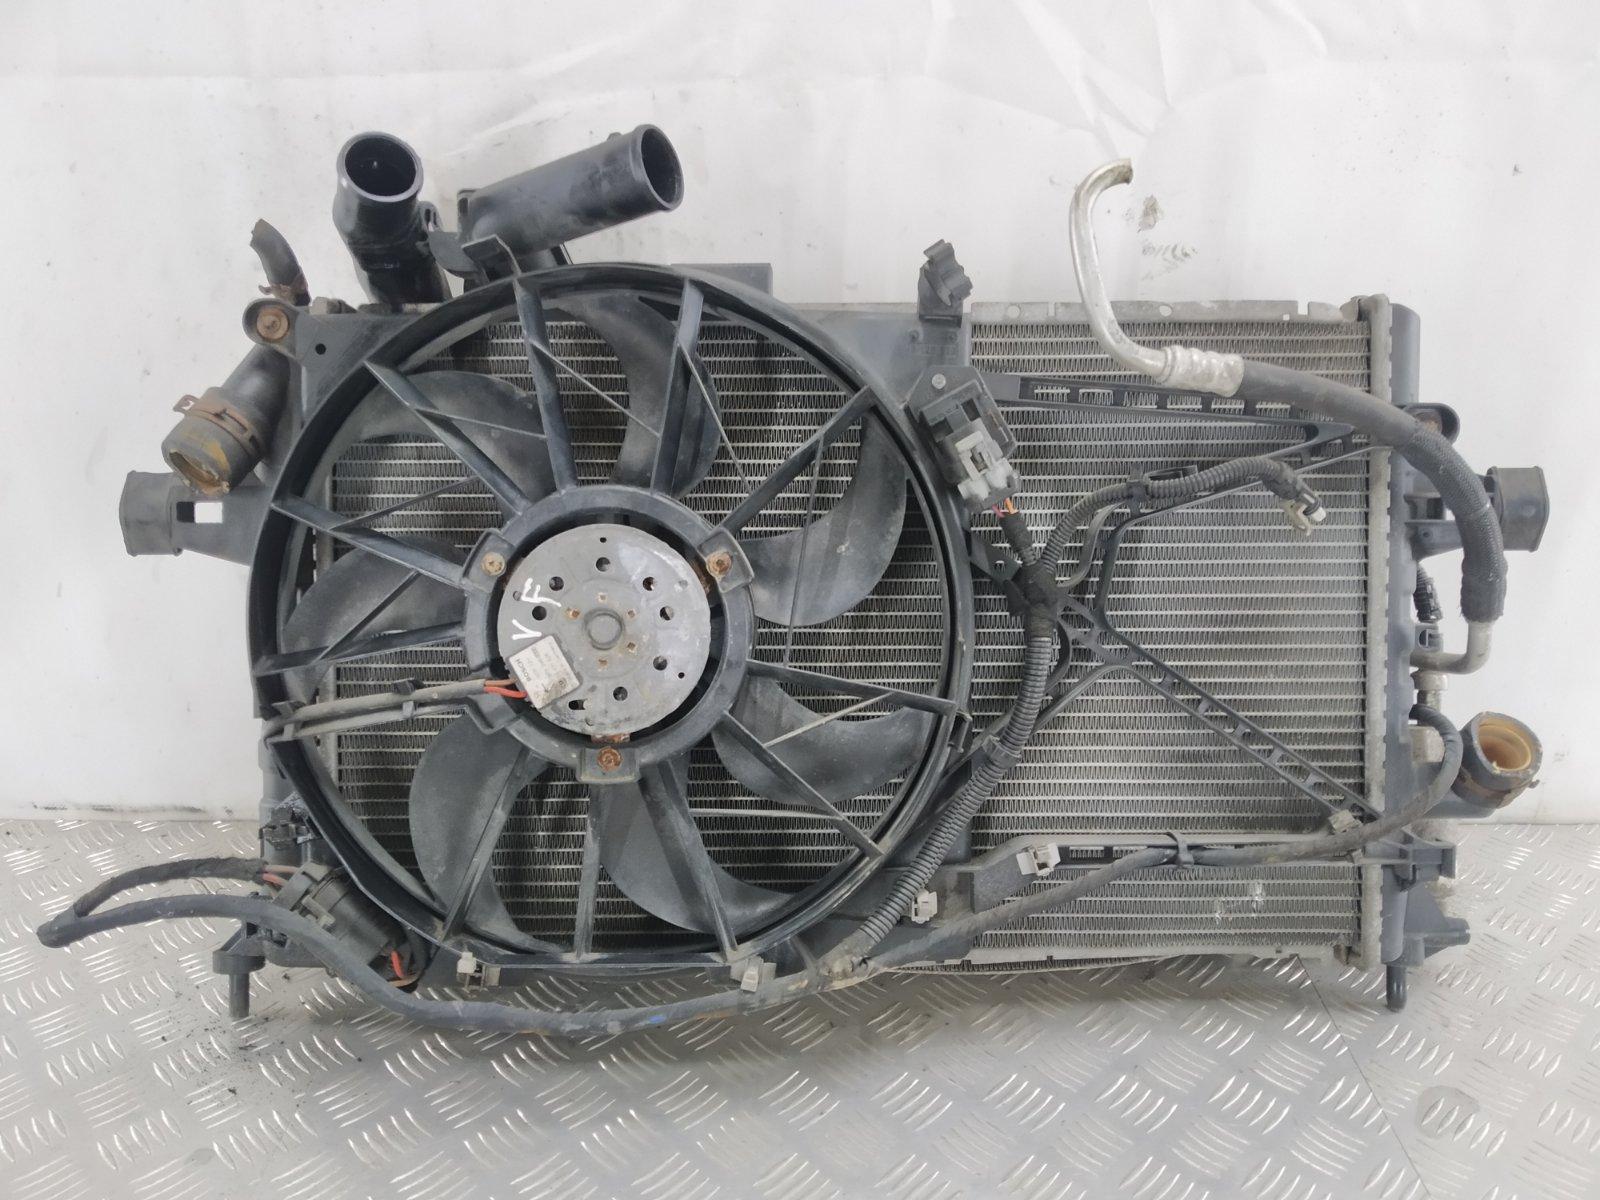 Кассета радиаторов Opel Astra G 1.7 CDTI 2004 (б/у)